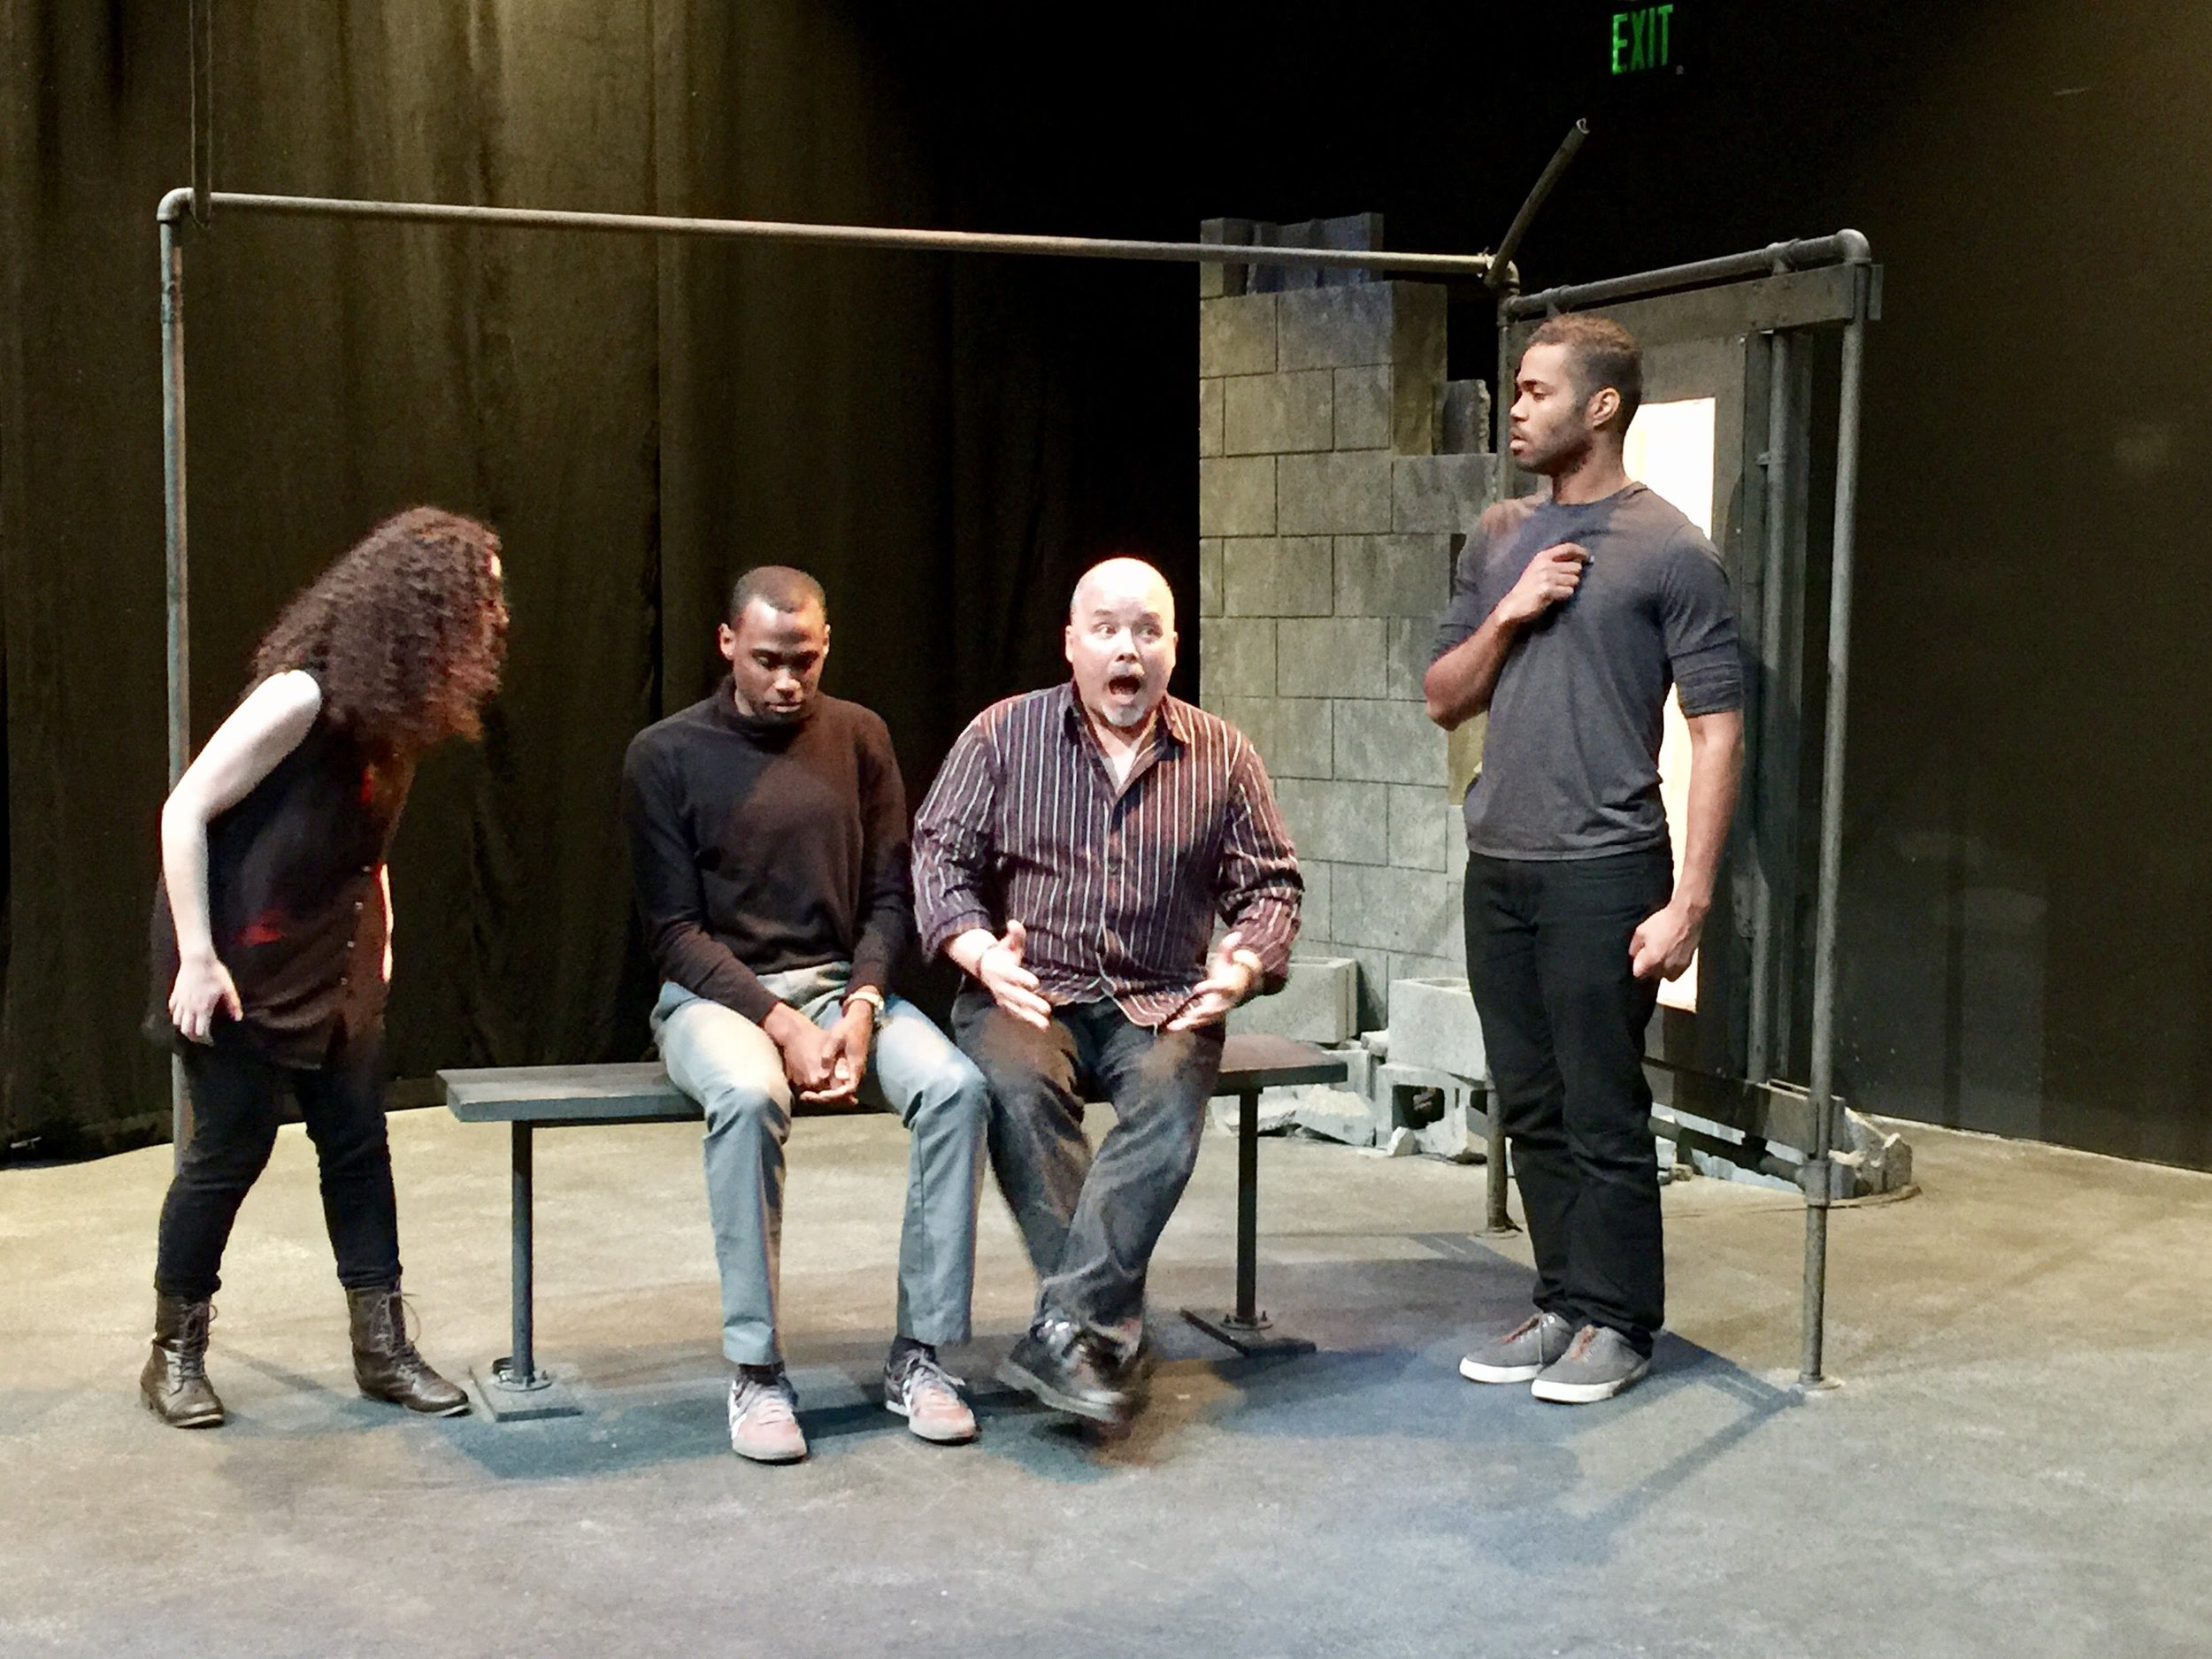 Aimee Goldstein, Gavin Whitt, Benjamin Lloyd and Dan Ison improvise on the set of  ironbound  at Simpatico Theater.